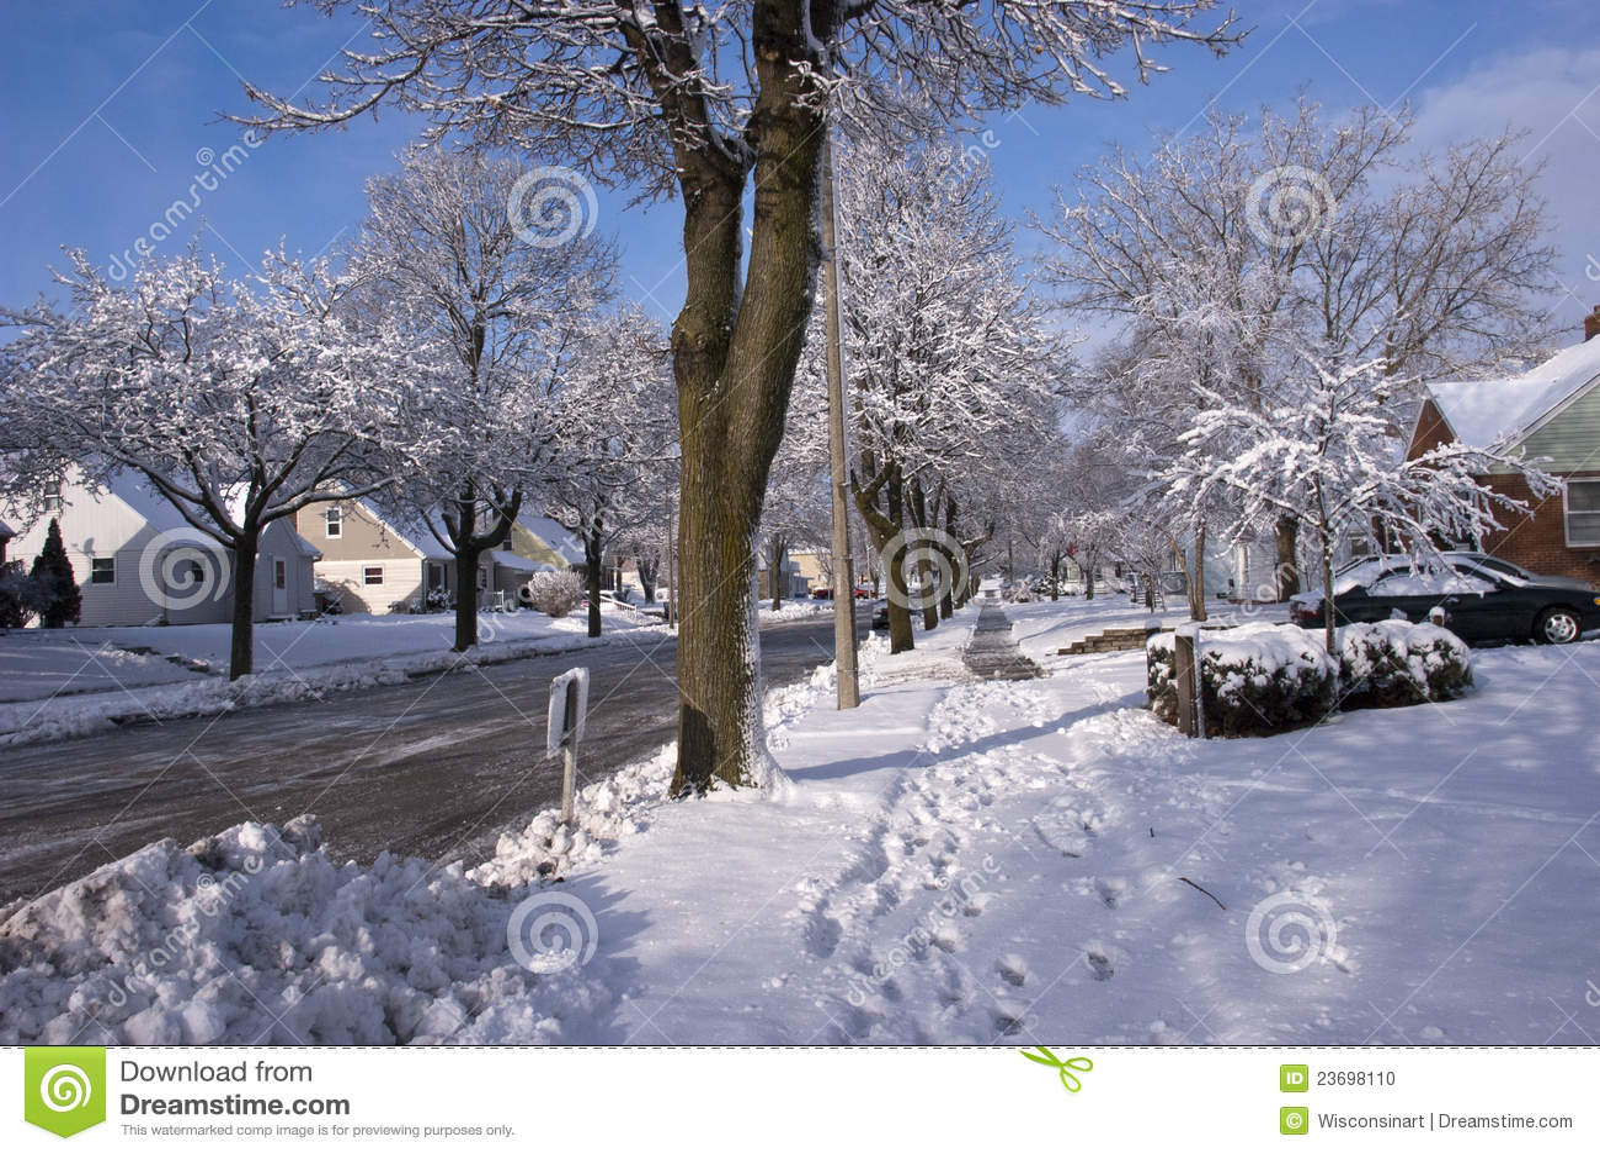 Free Fall Season Wallpapers City In Winter Houses Homes Neighborhood Snow Stock